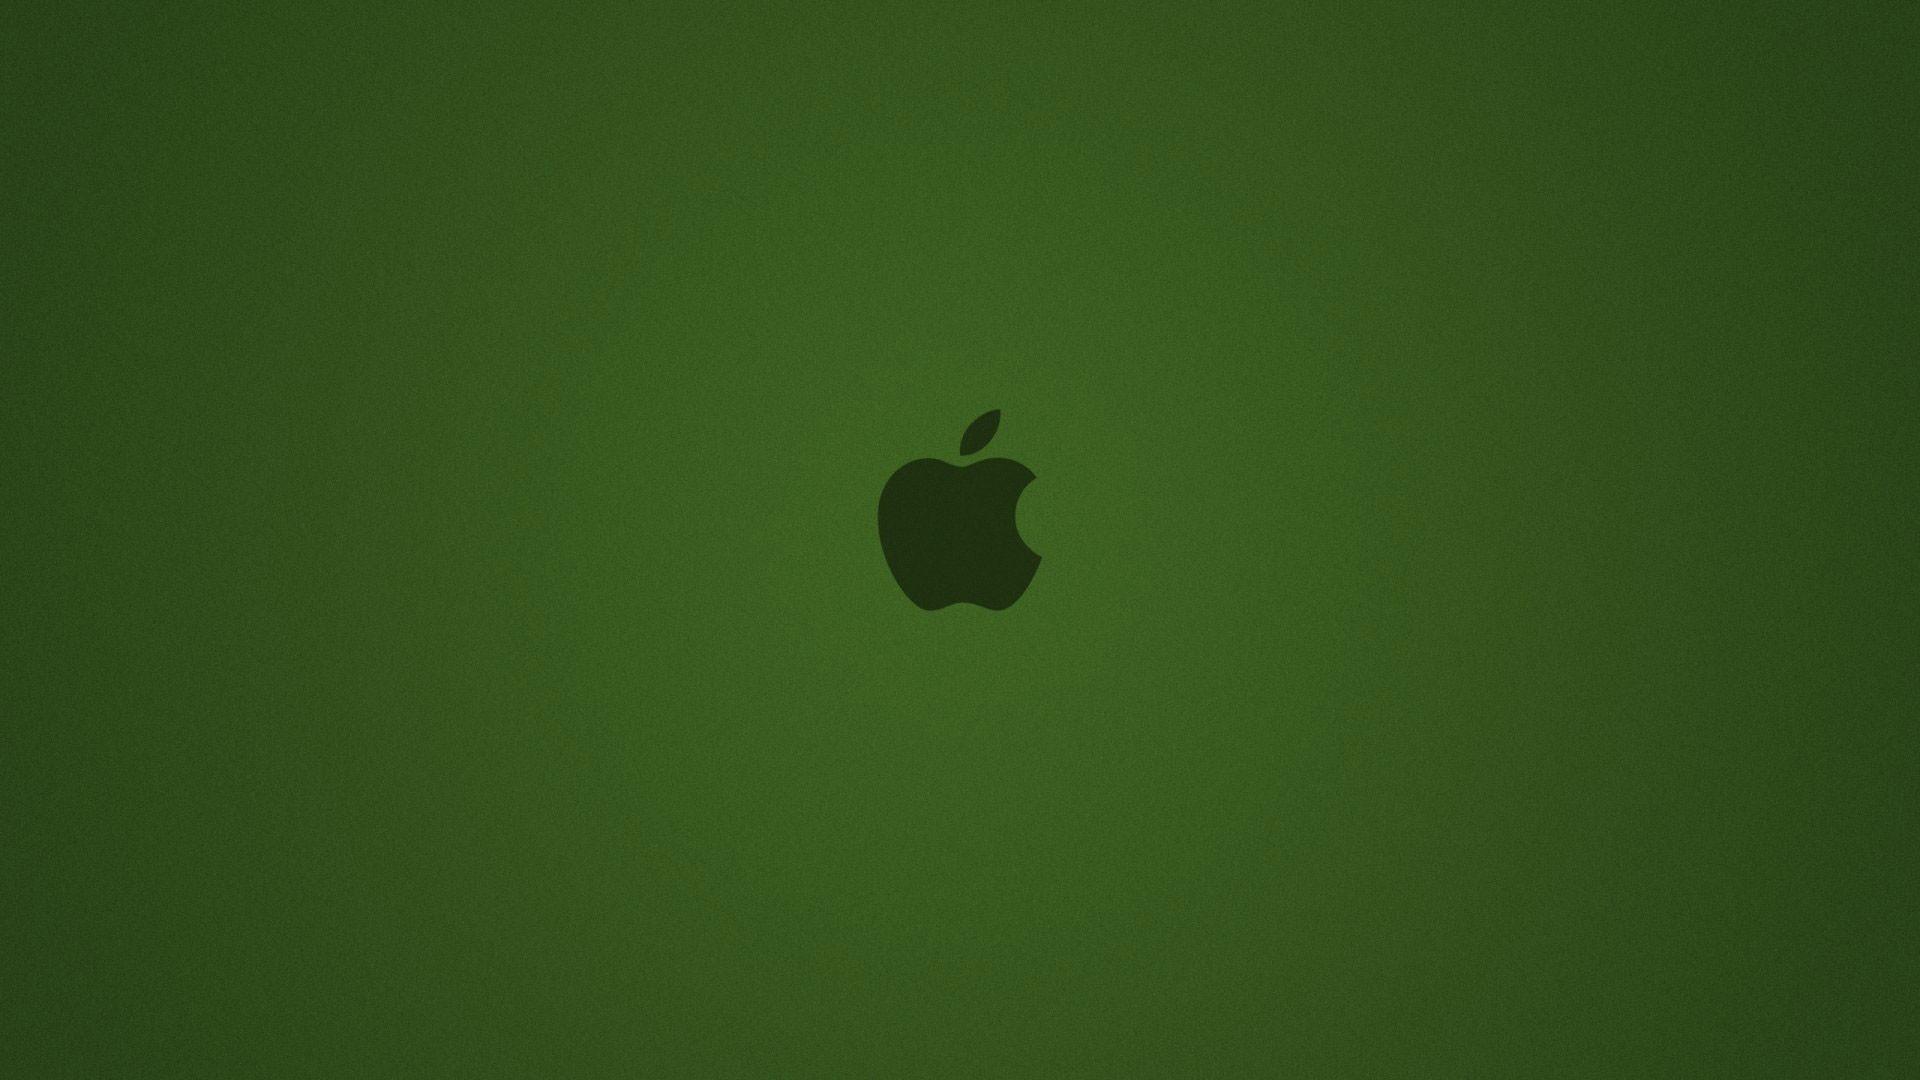 hd pics photos green apple logo dark hd quality desktop background wallpaper